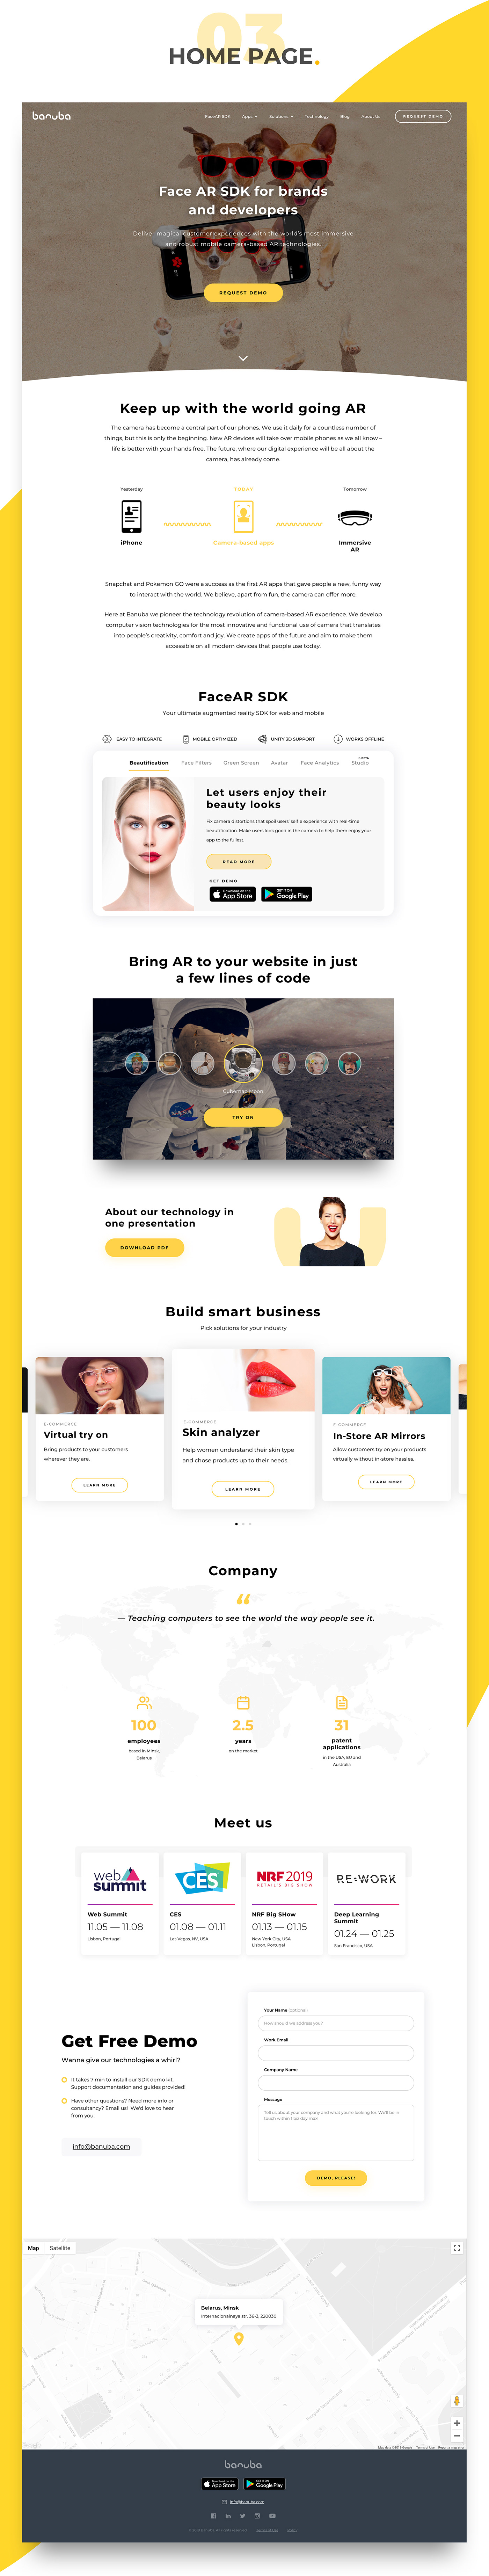 ux UI Website web ar design user experience Web user interface yellow